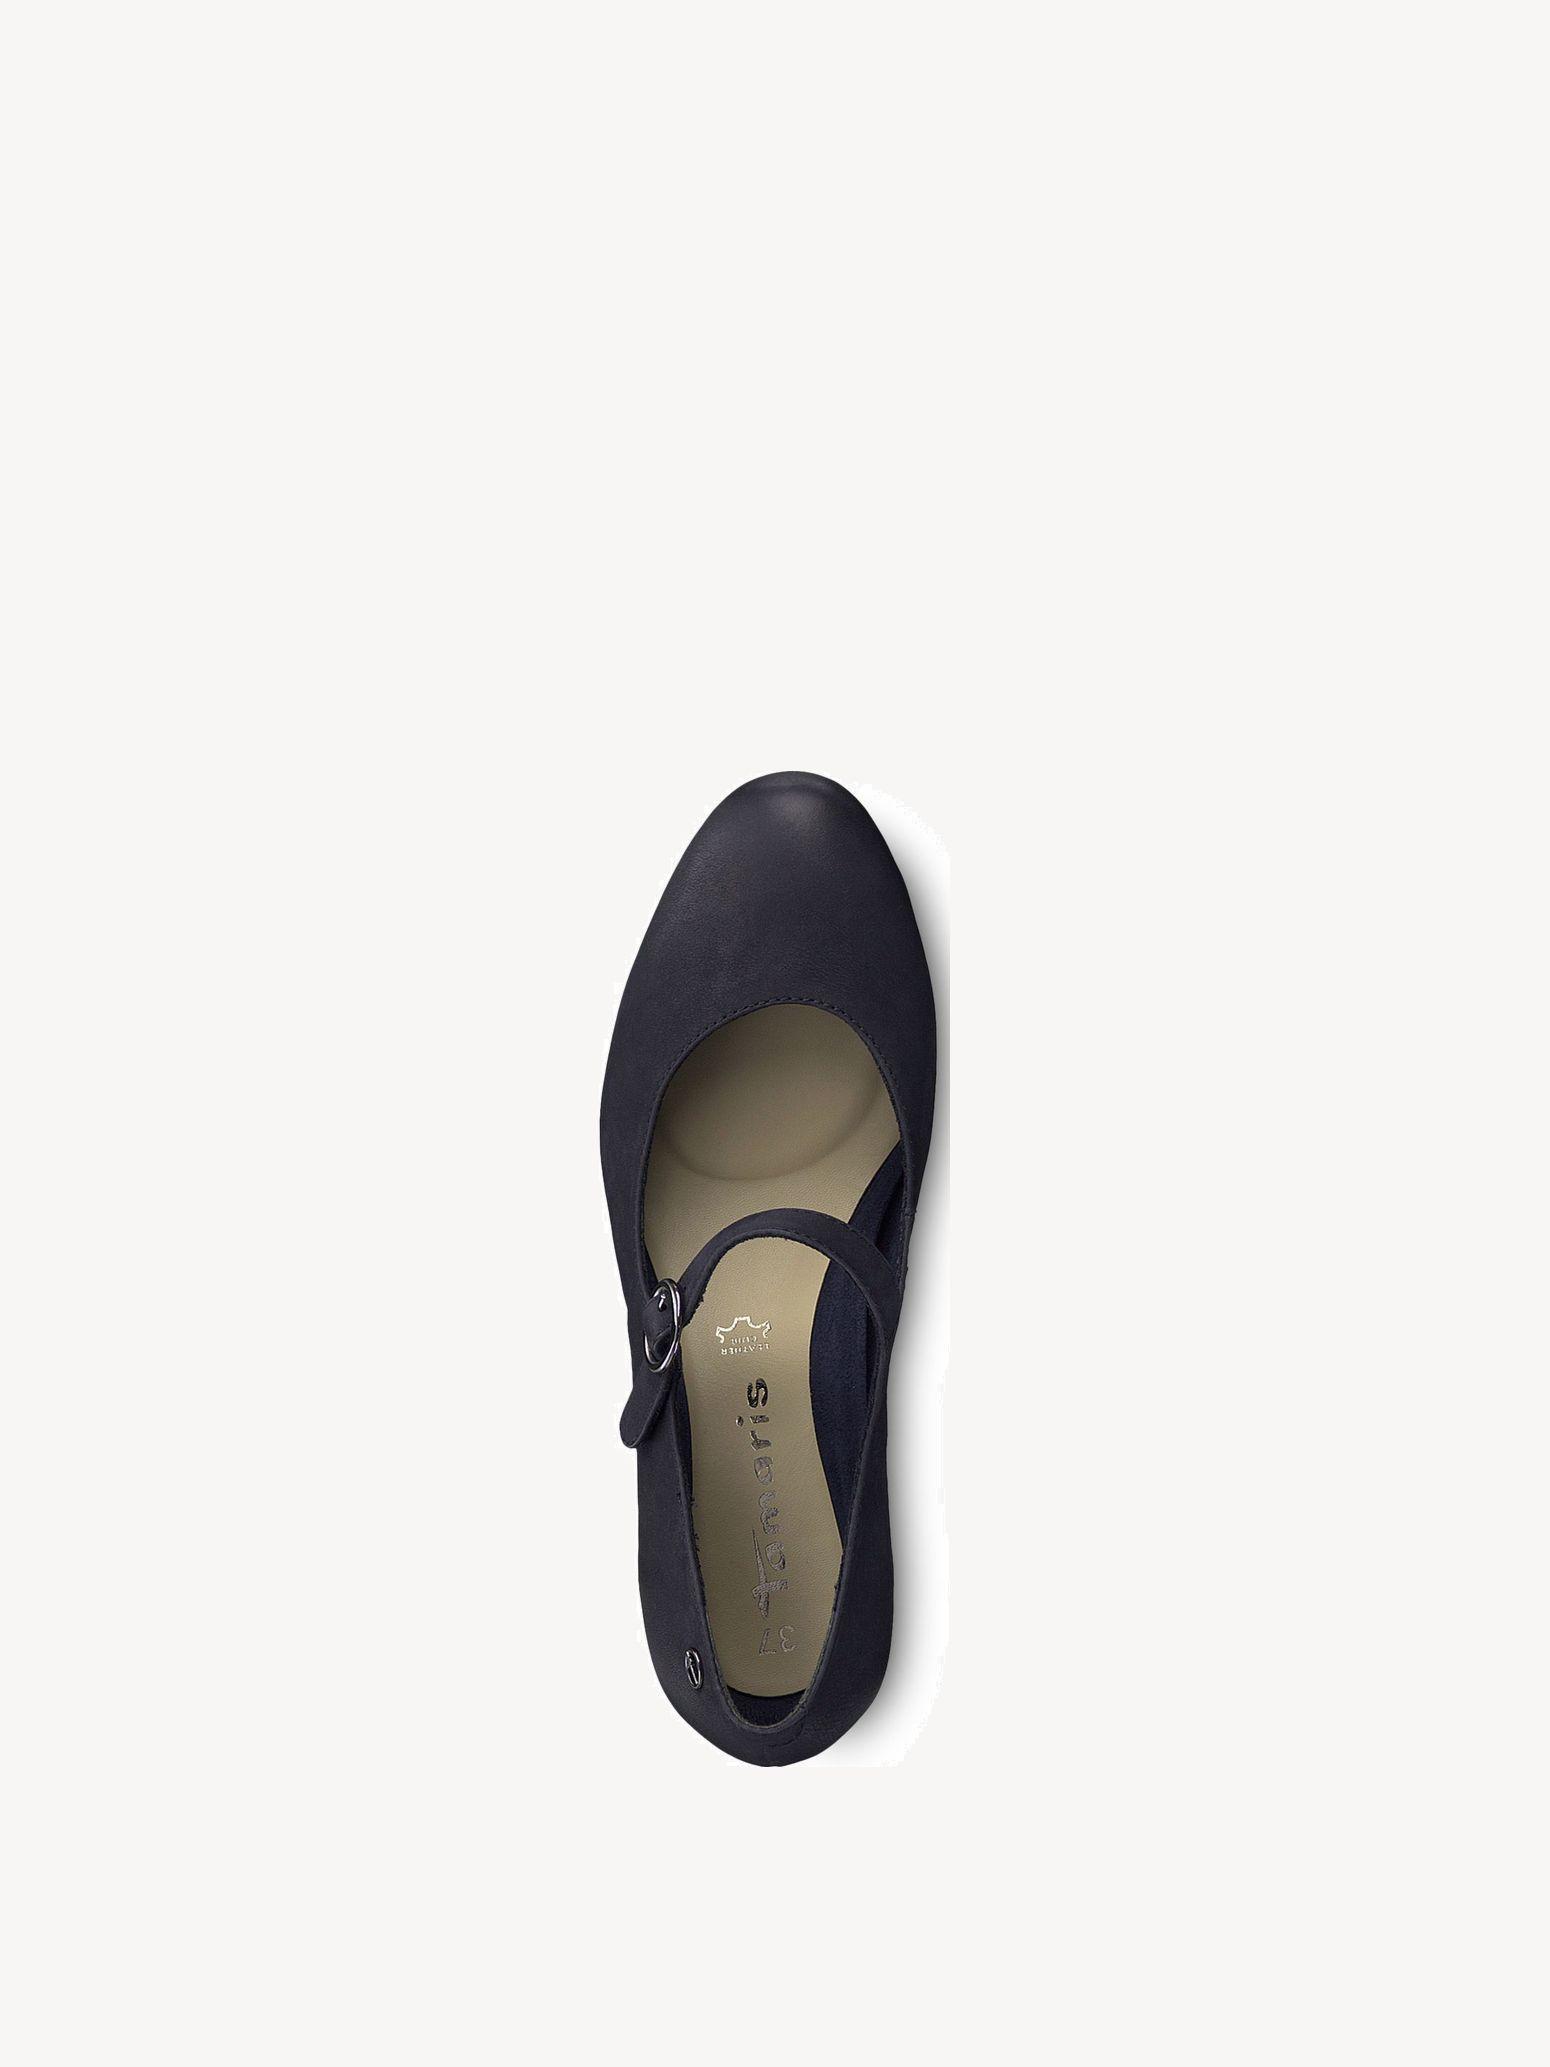 Stiefel Pedas Stiefel Tamaris Blau Pedas Tamaris Blau Tamaris 5L3R4Acjq